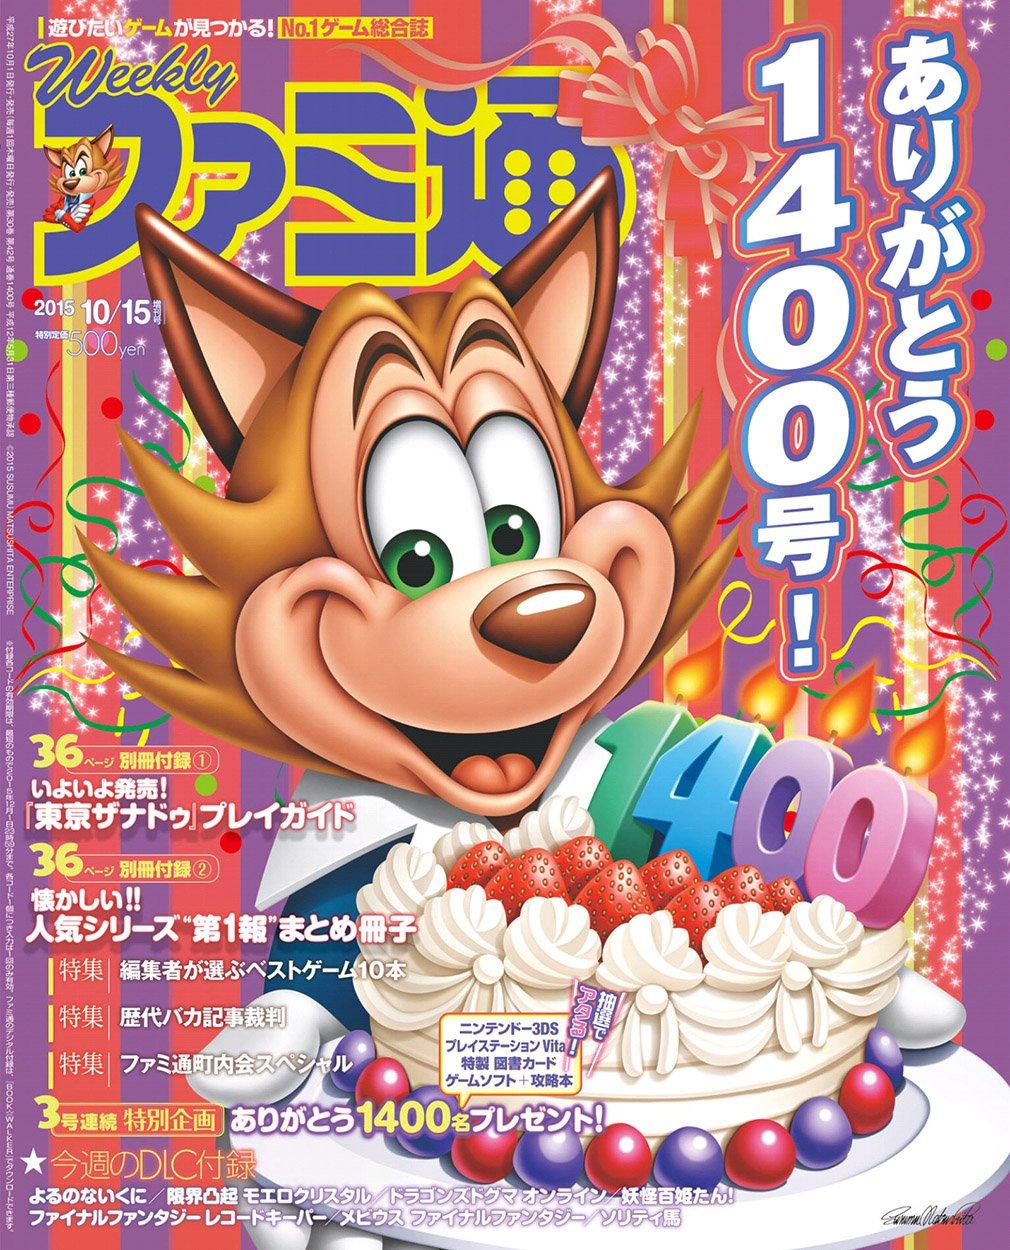 Famitsu 1400  October 15, 2015